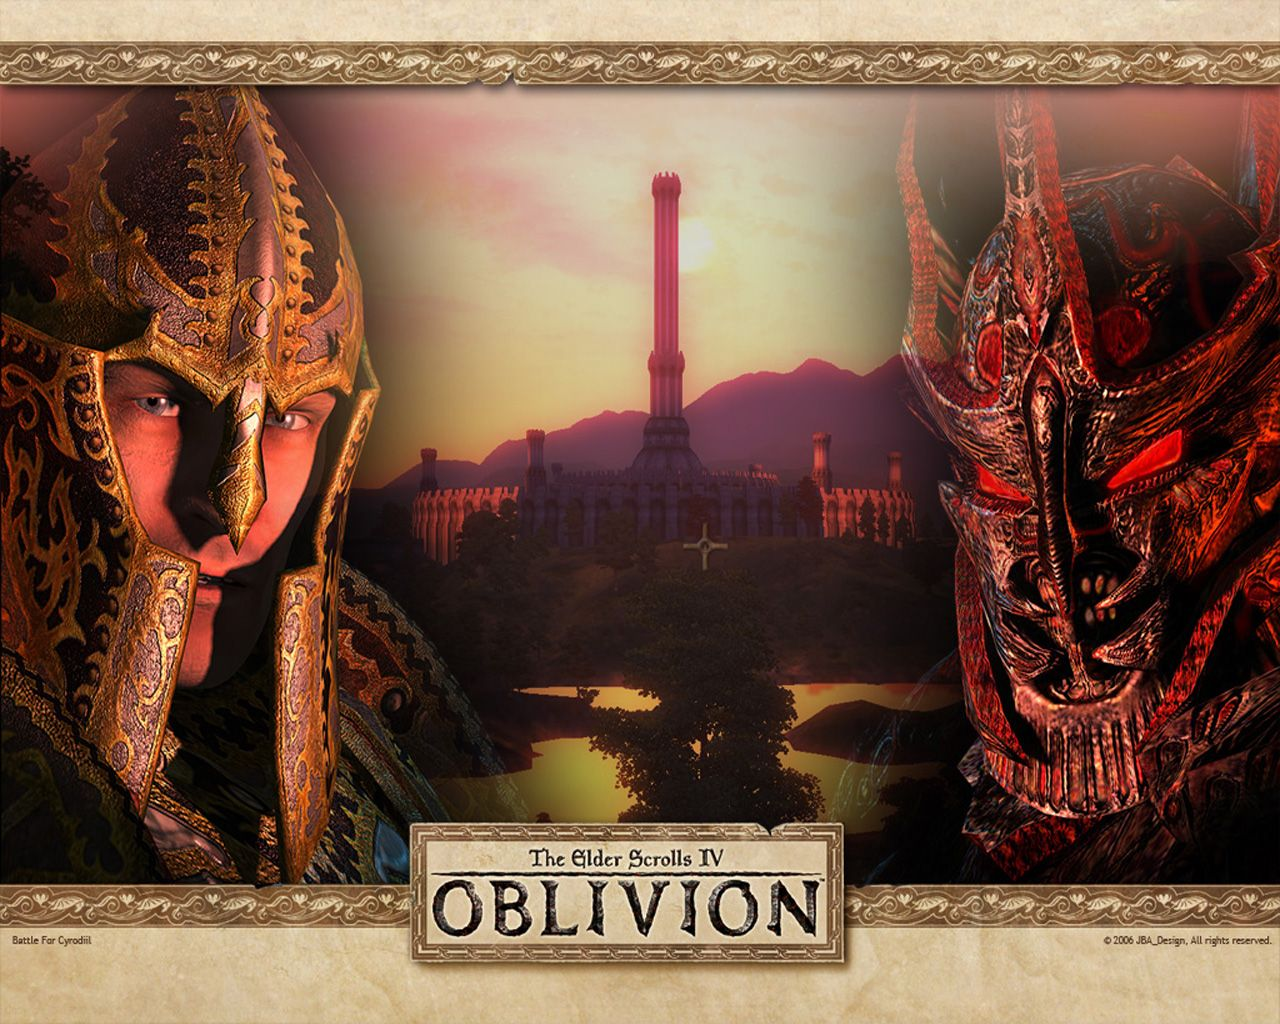 Oblivion Wallpaper wallpaper wallpaper hd background desktop 1280x1024